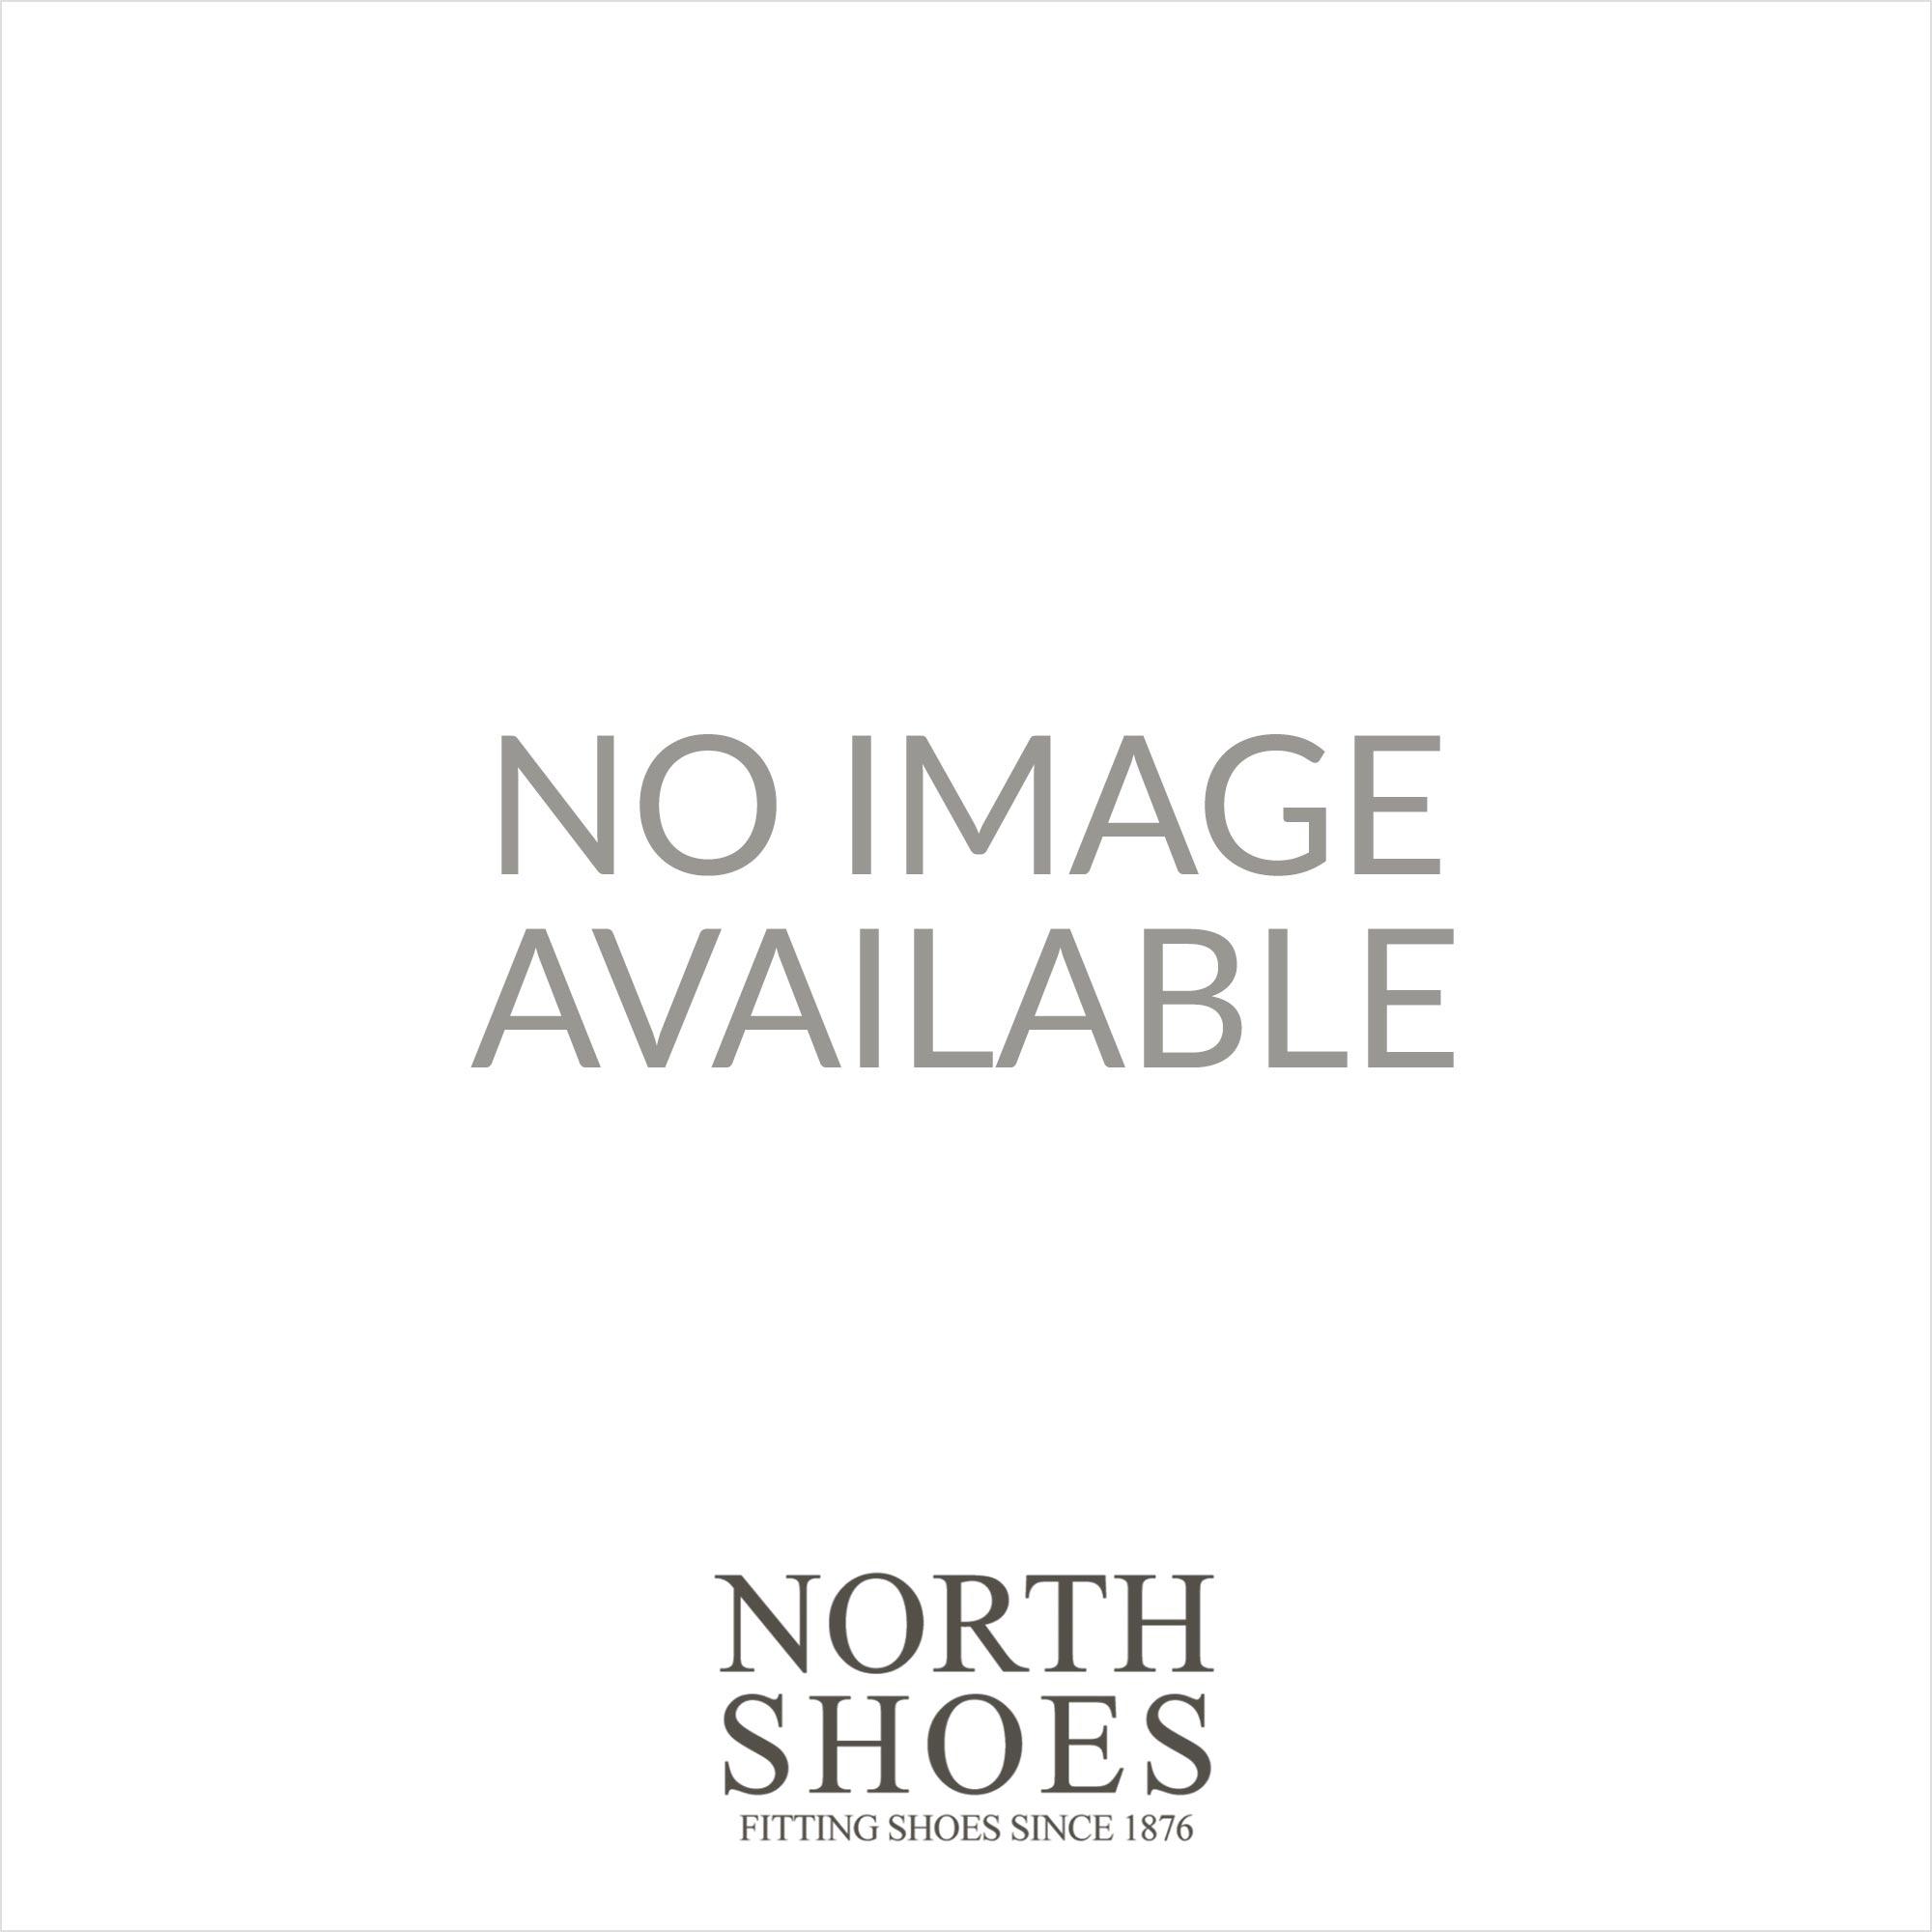 halvin hinta kilpailukykyinen hinta klassiset kengät Atwood VK2U8IX Pink Canvas Girls Lace Up Shoes